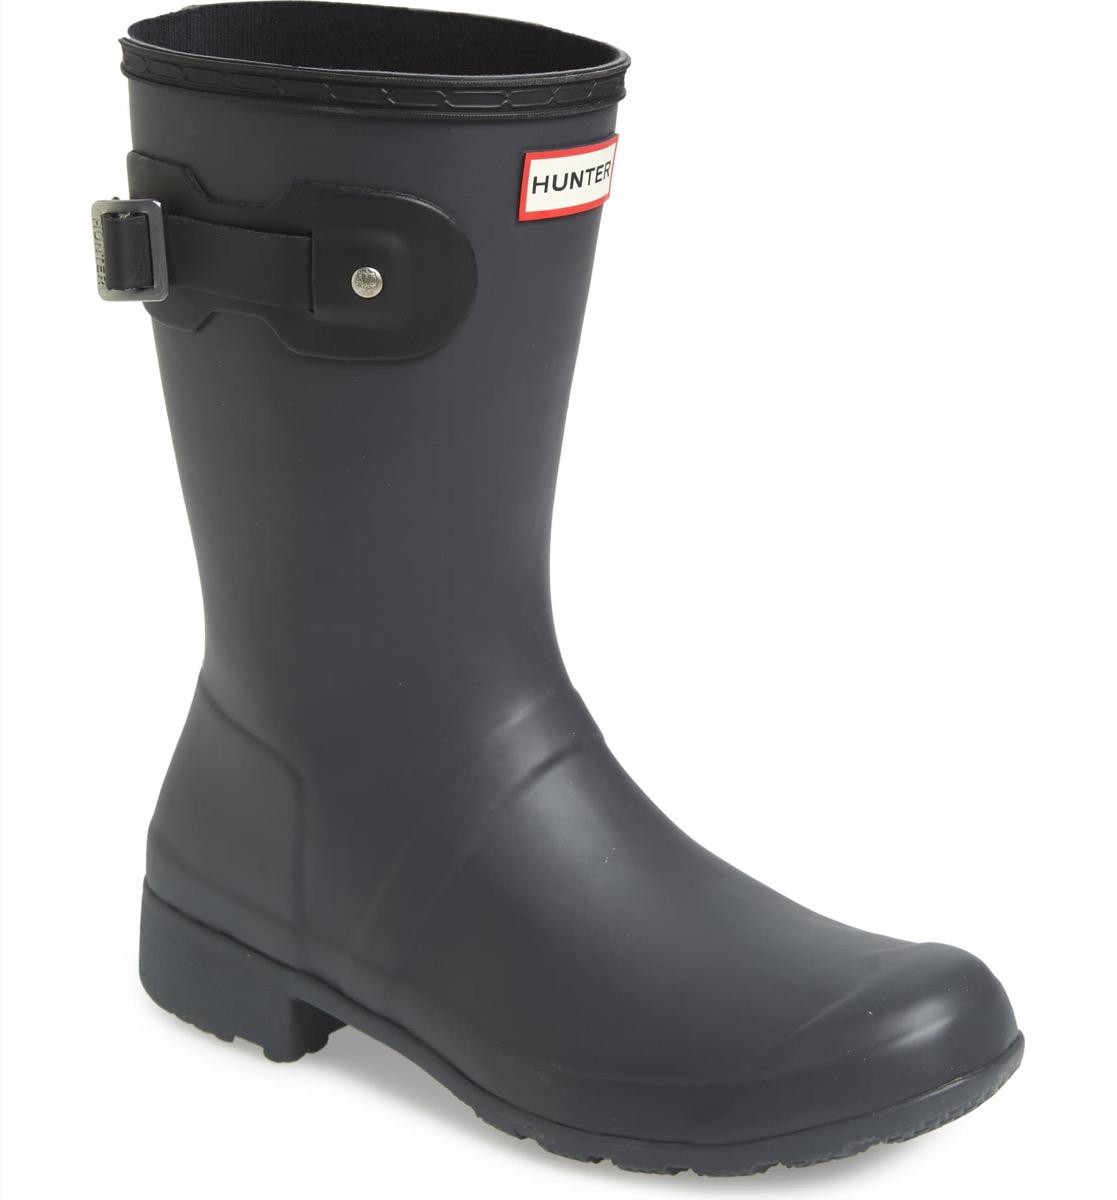 black hunter rain boots, Nordstrom anniversary sale